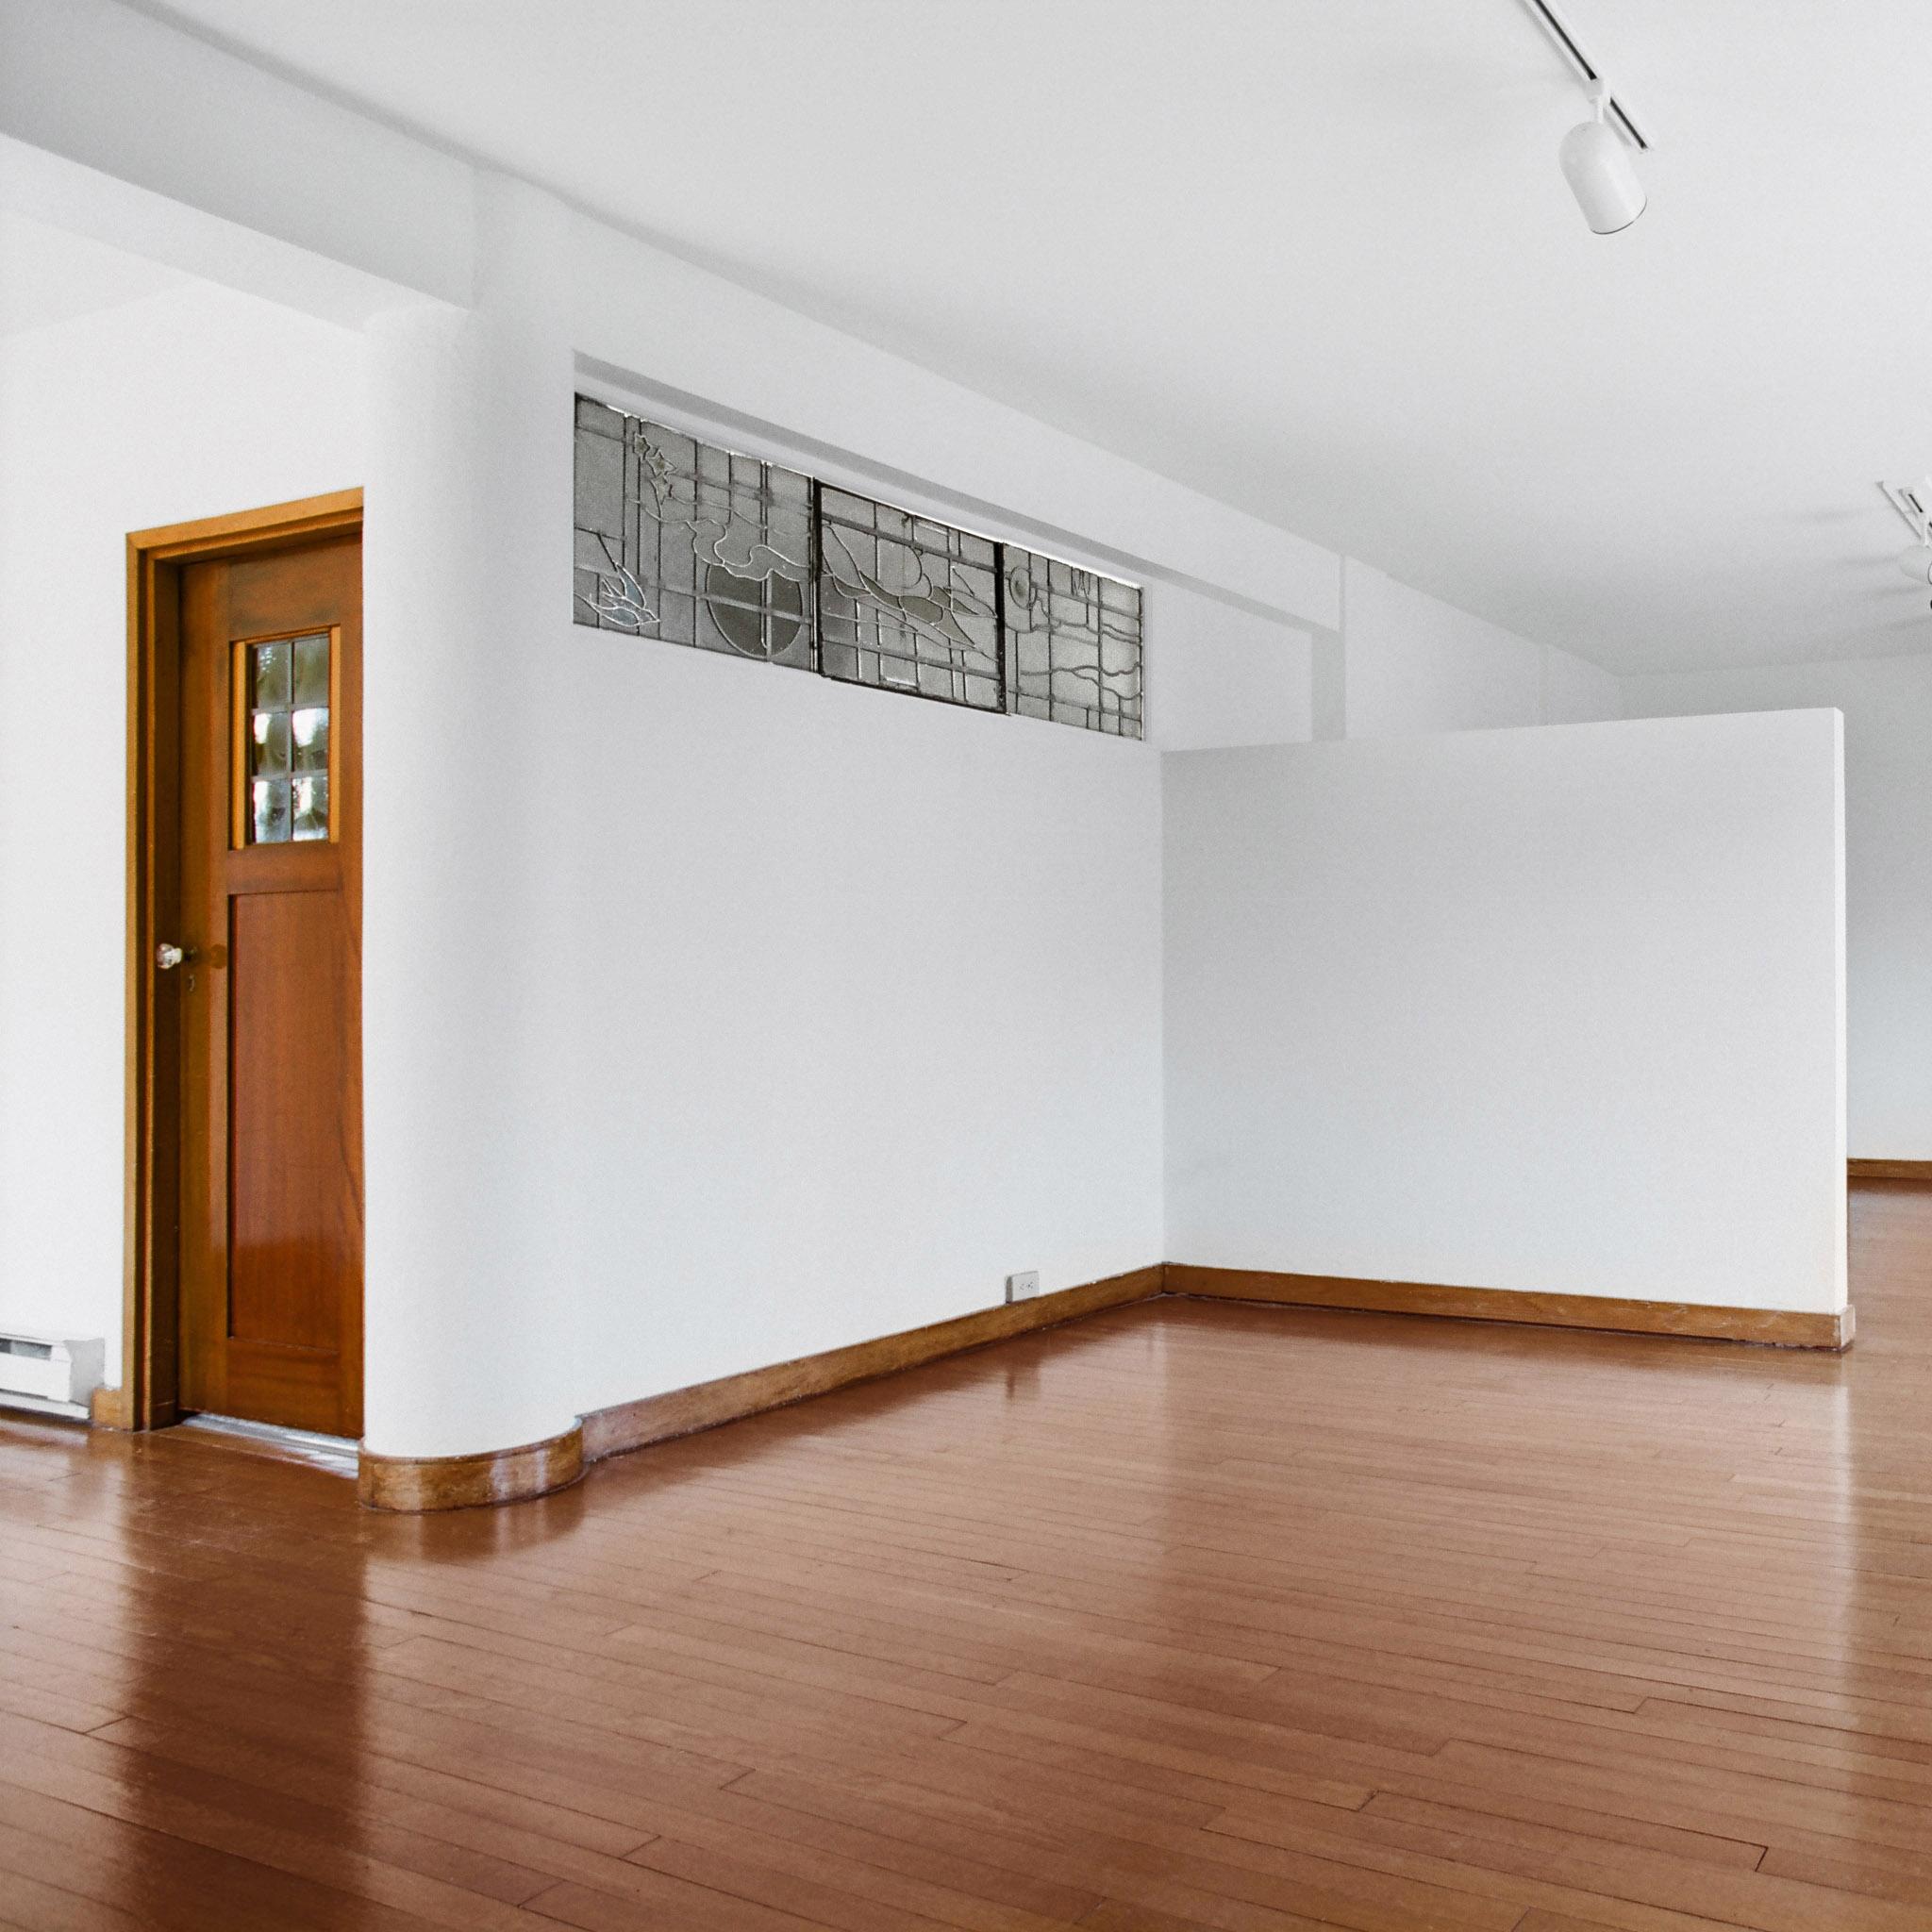 interior of 340 S. Highland Ave, Apt. 5A 2